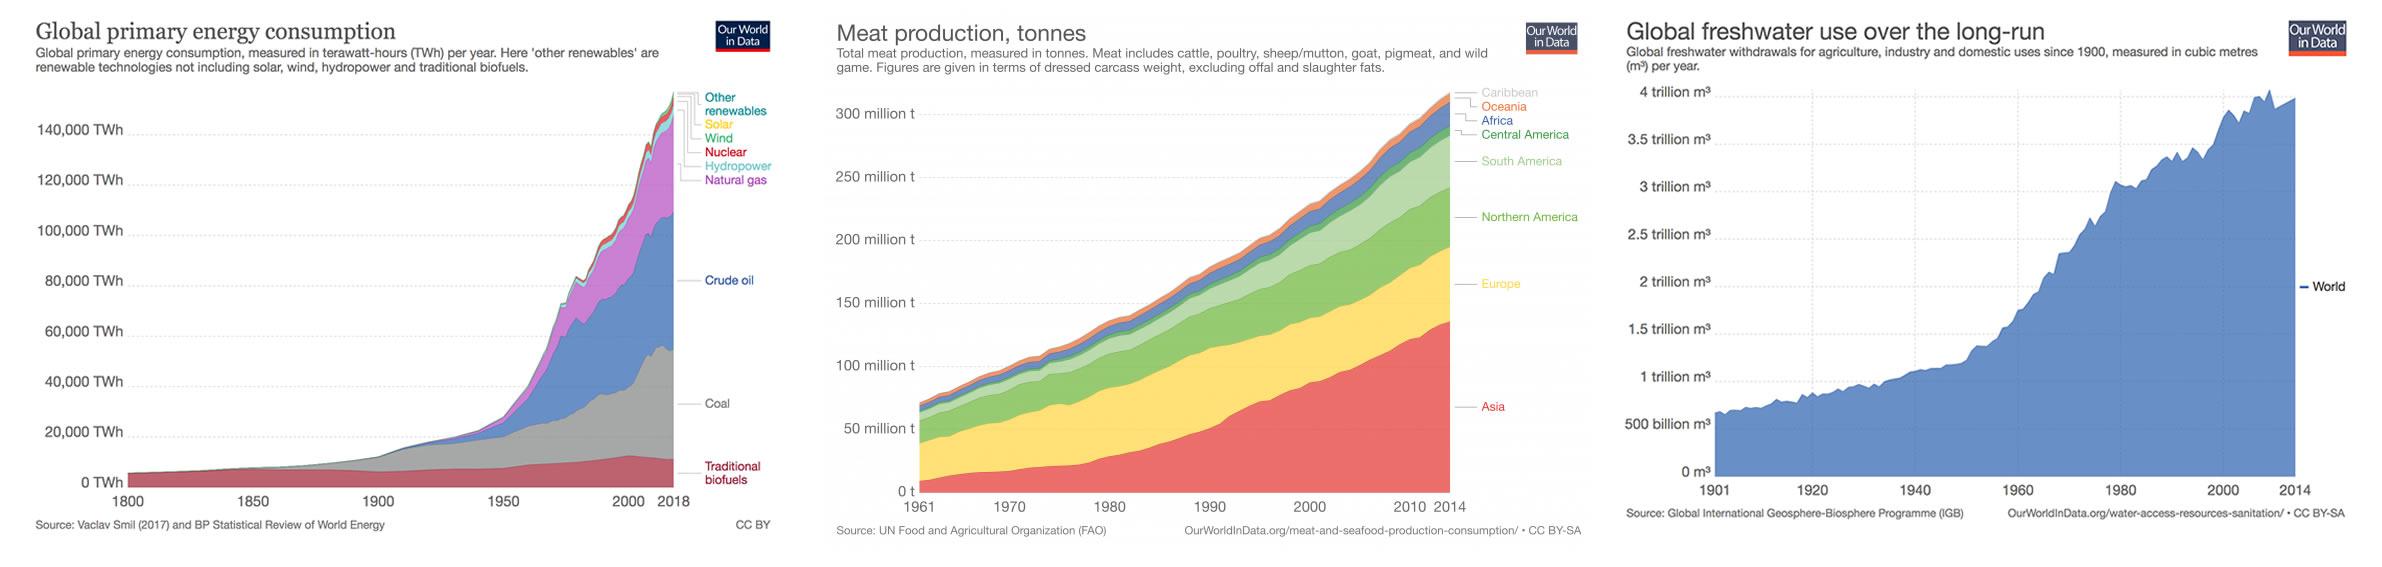 resource depletion per capita charts